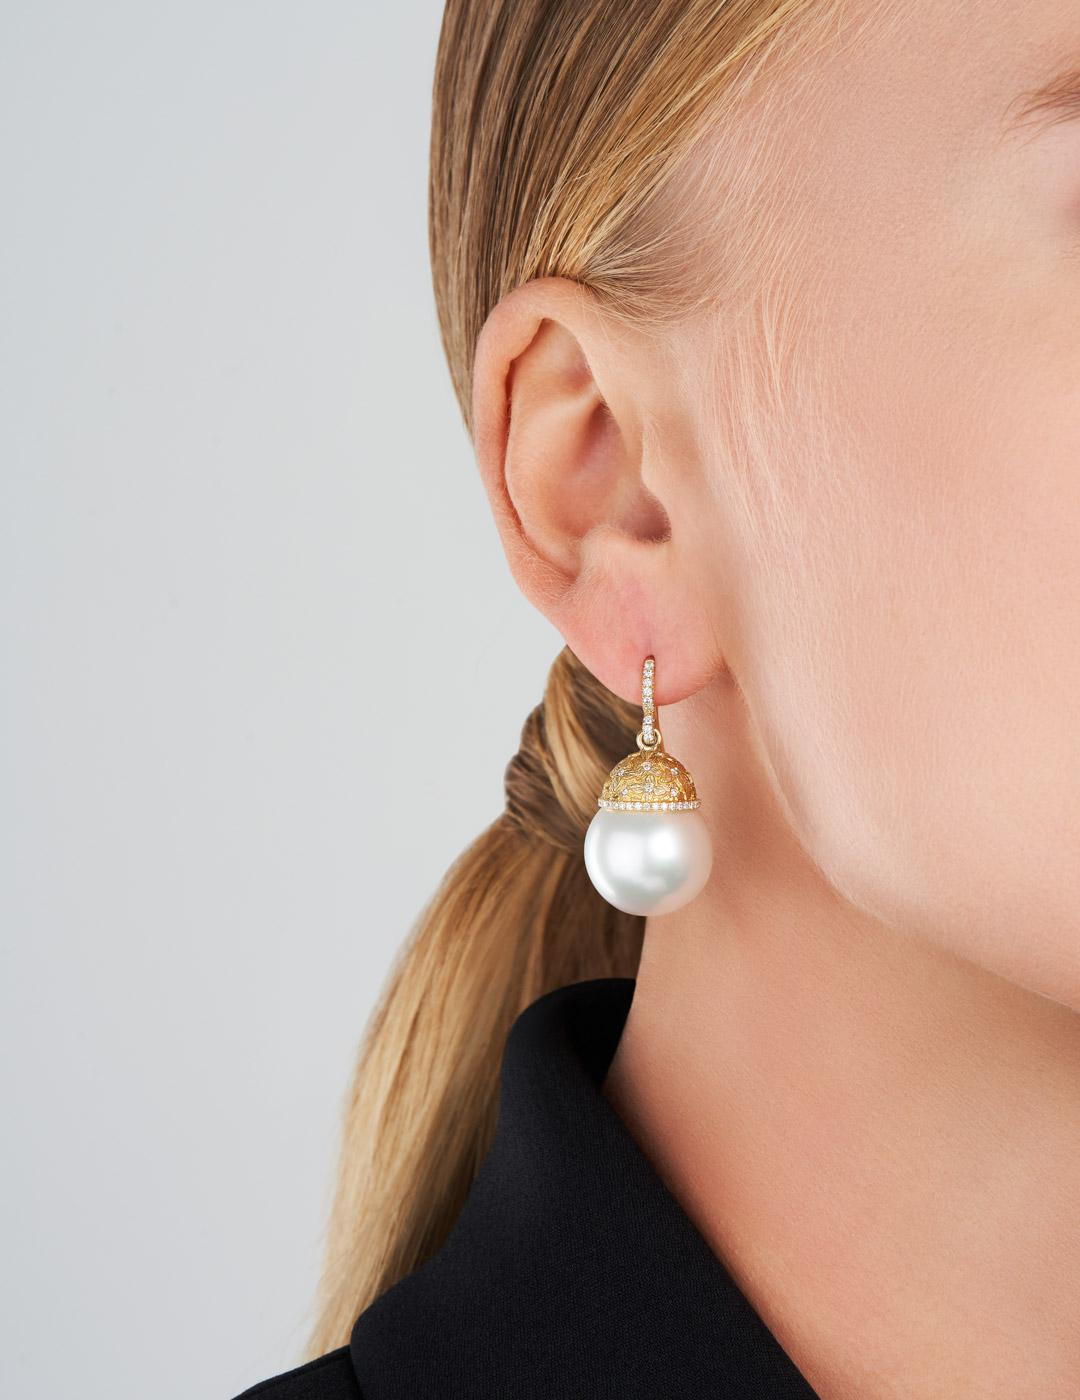 mish_products_earrings_Hydrangea Cap-FW-ER-2